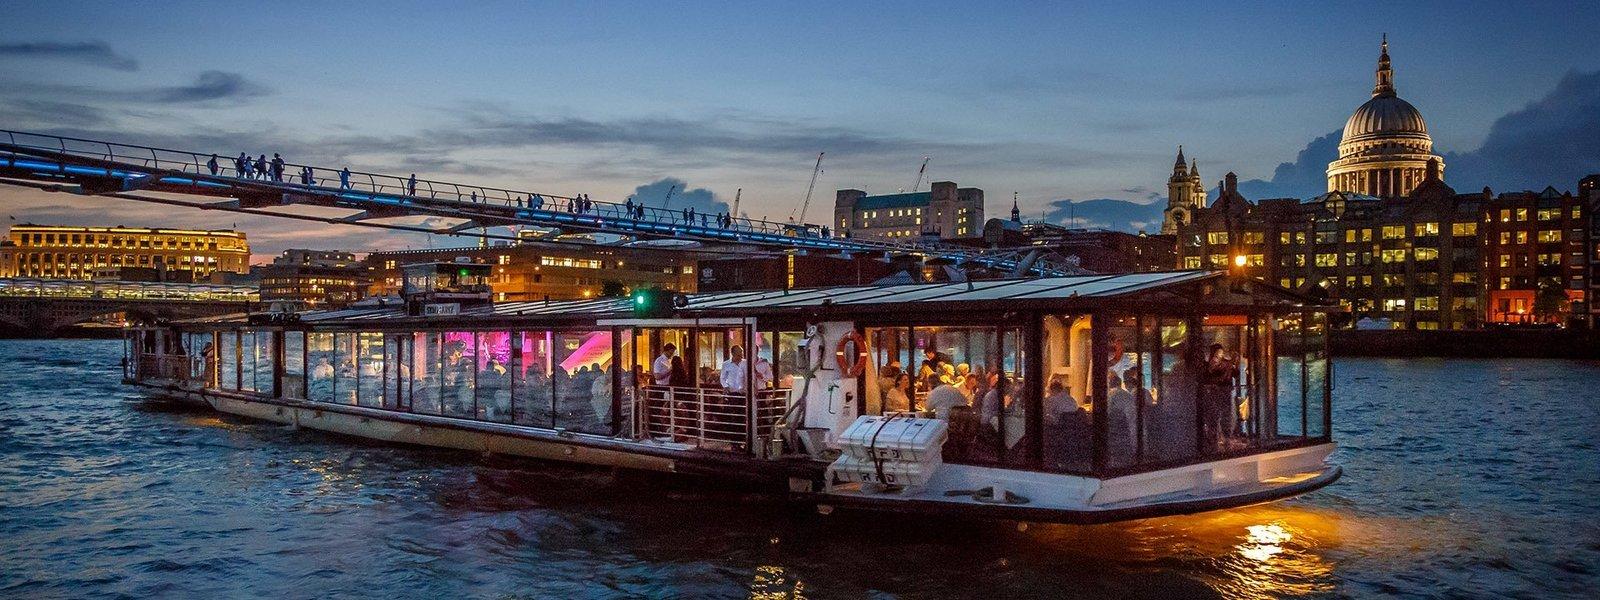 Bateaux London Classic Dinner Cruise - Tour